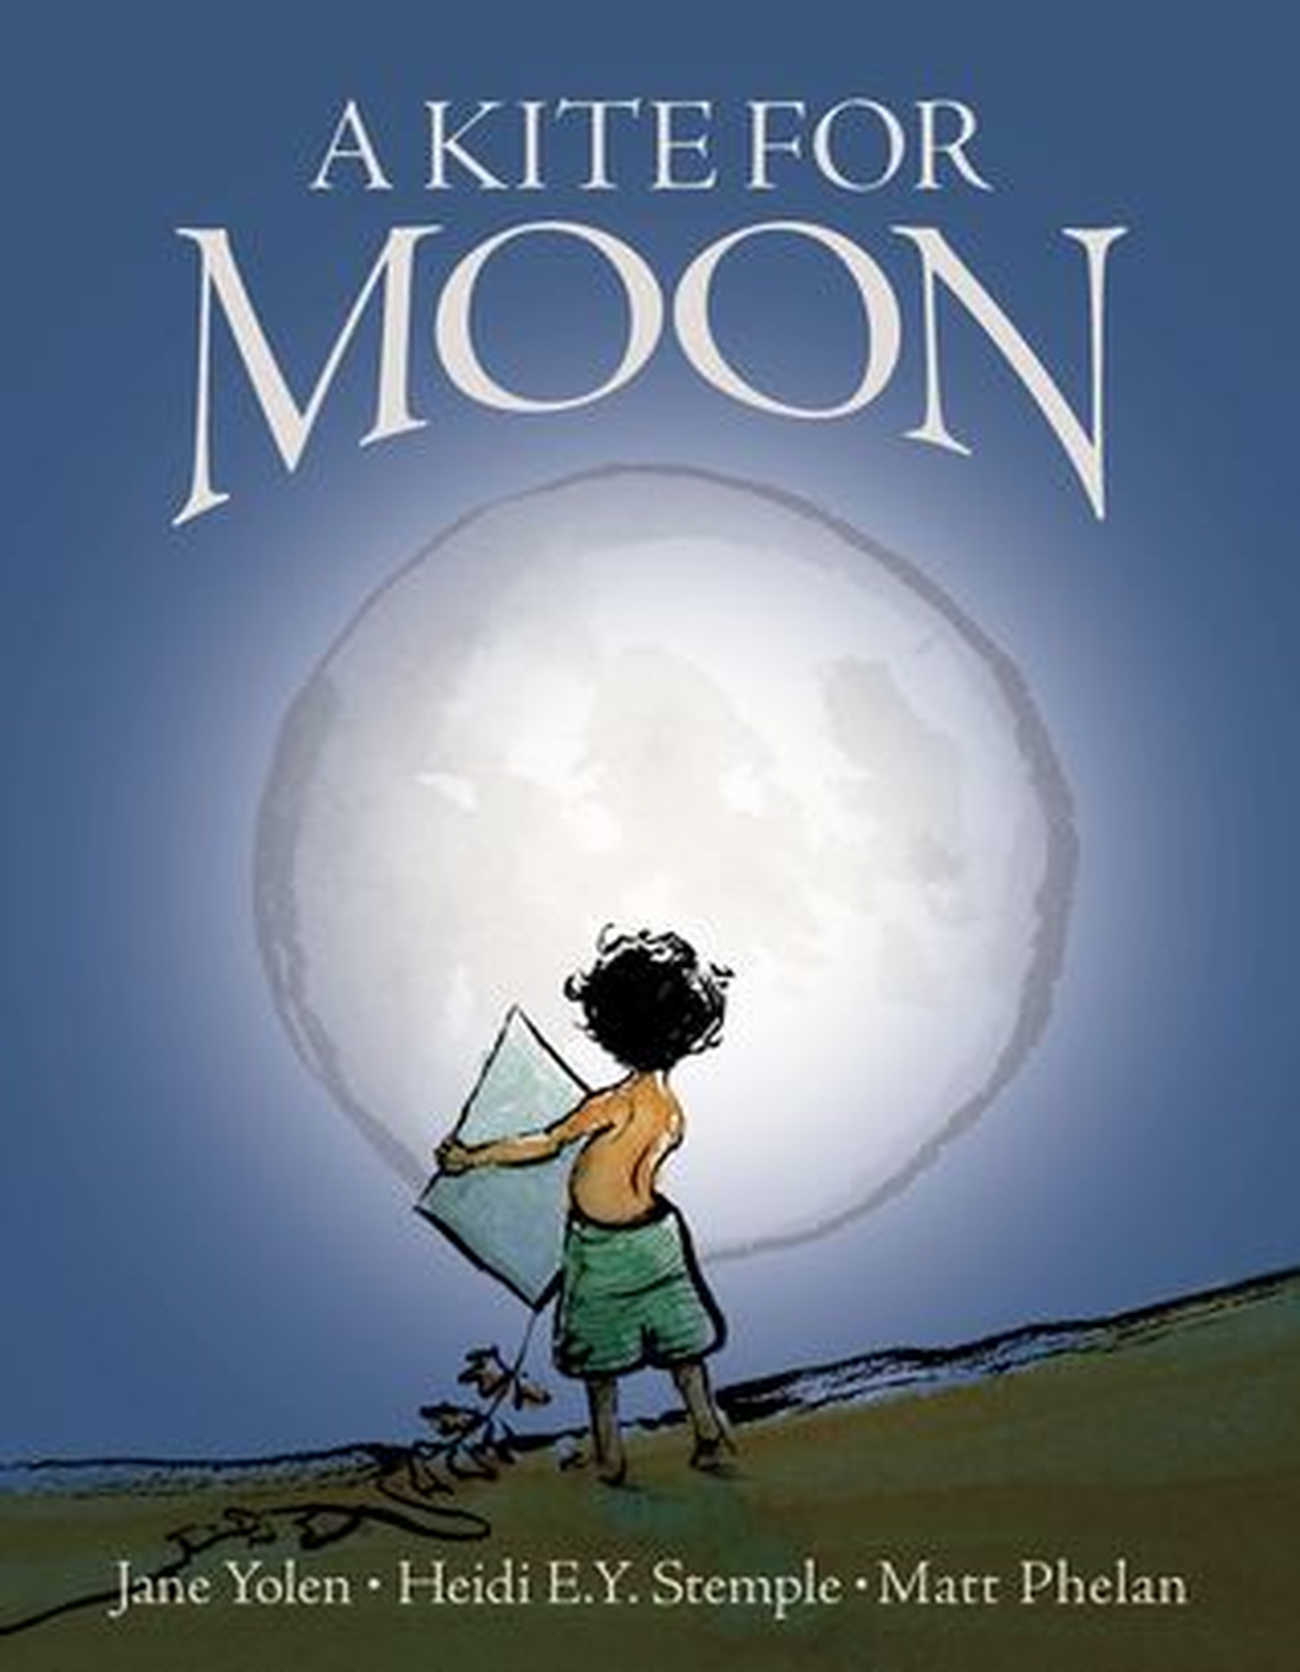 BWW Review: A KITE FOR MOON by Jane Yolen, Heidi E.Y. Stemple, and Matt Phelan